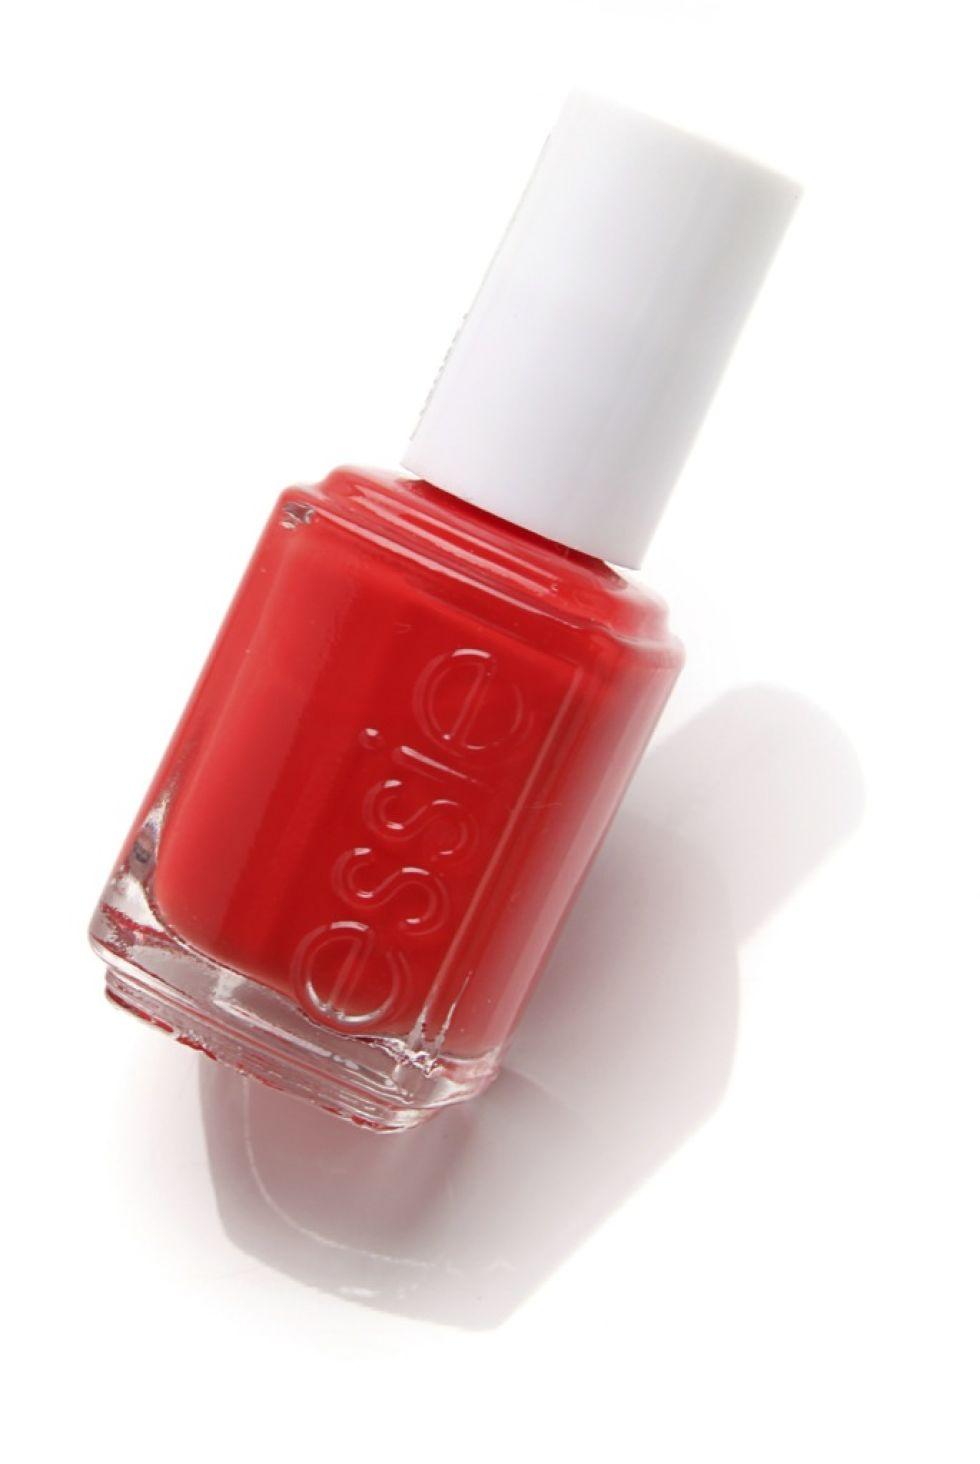 Esmalte de uñas: todo al rojo